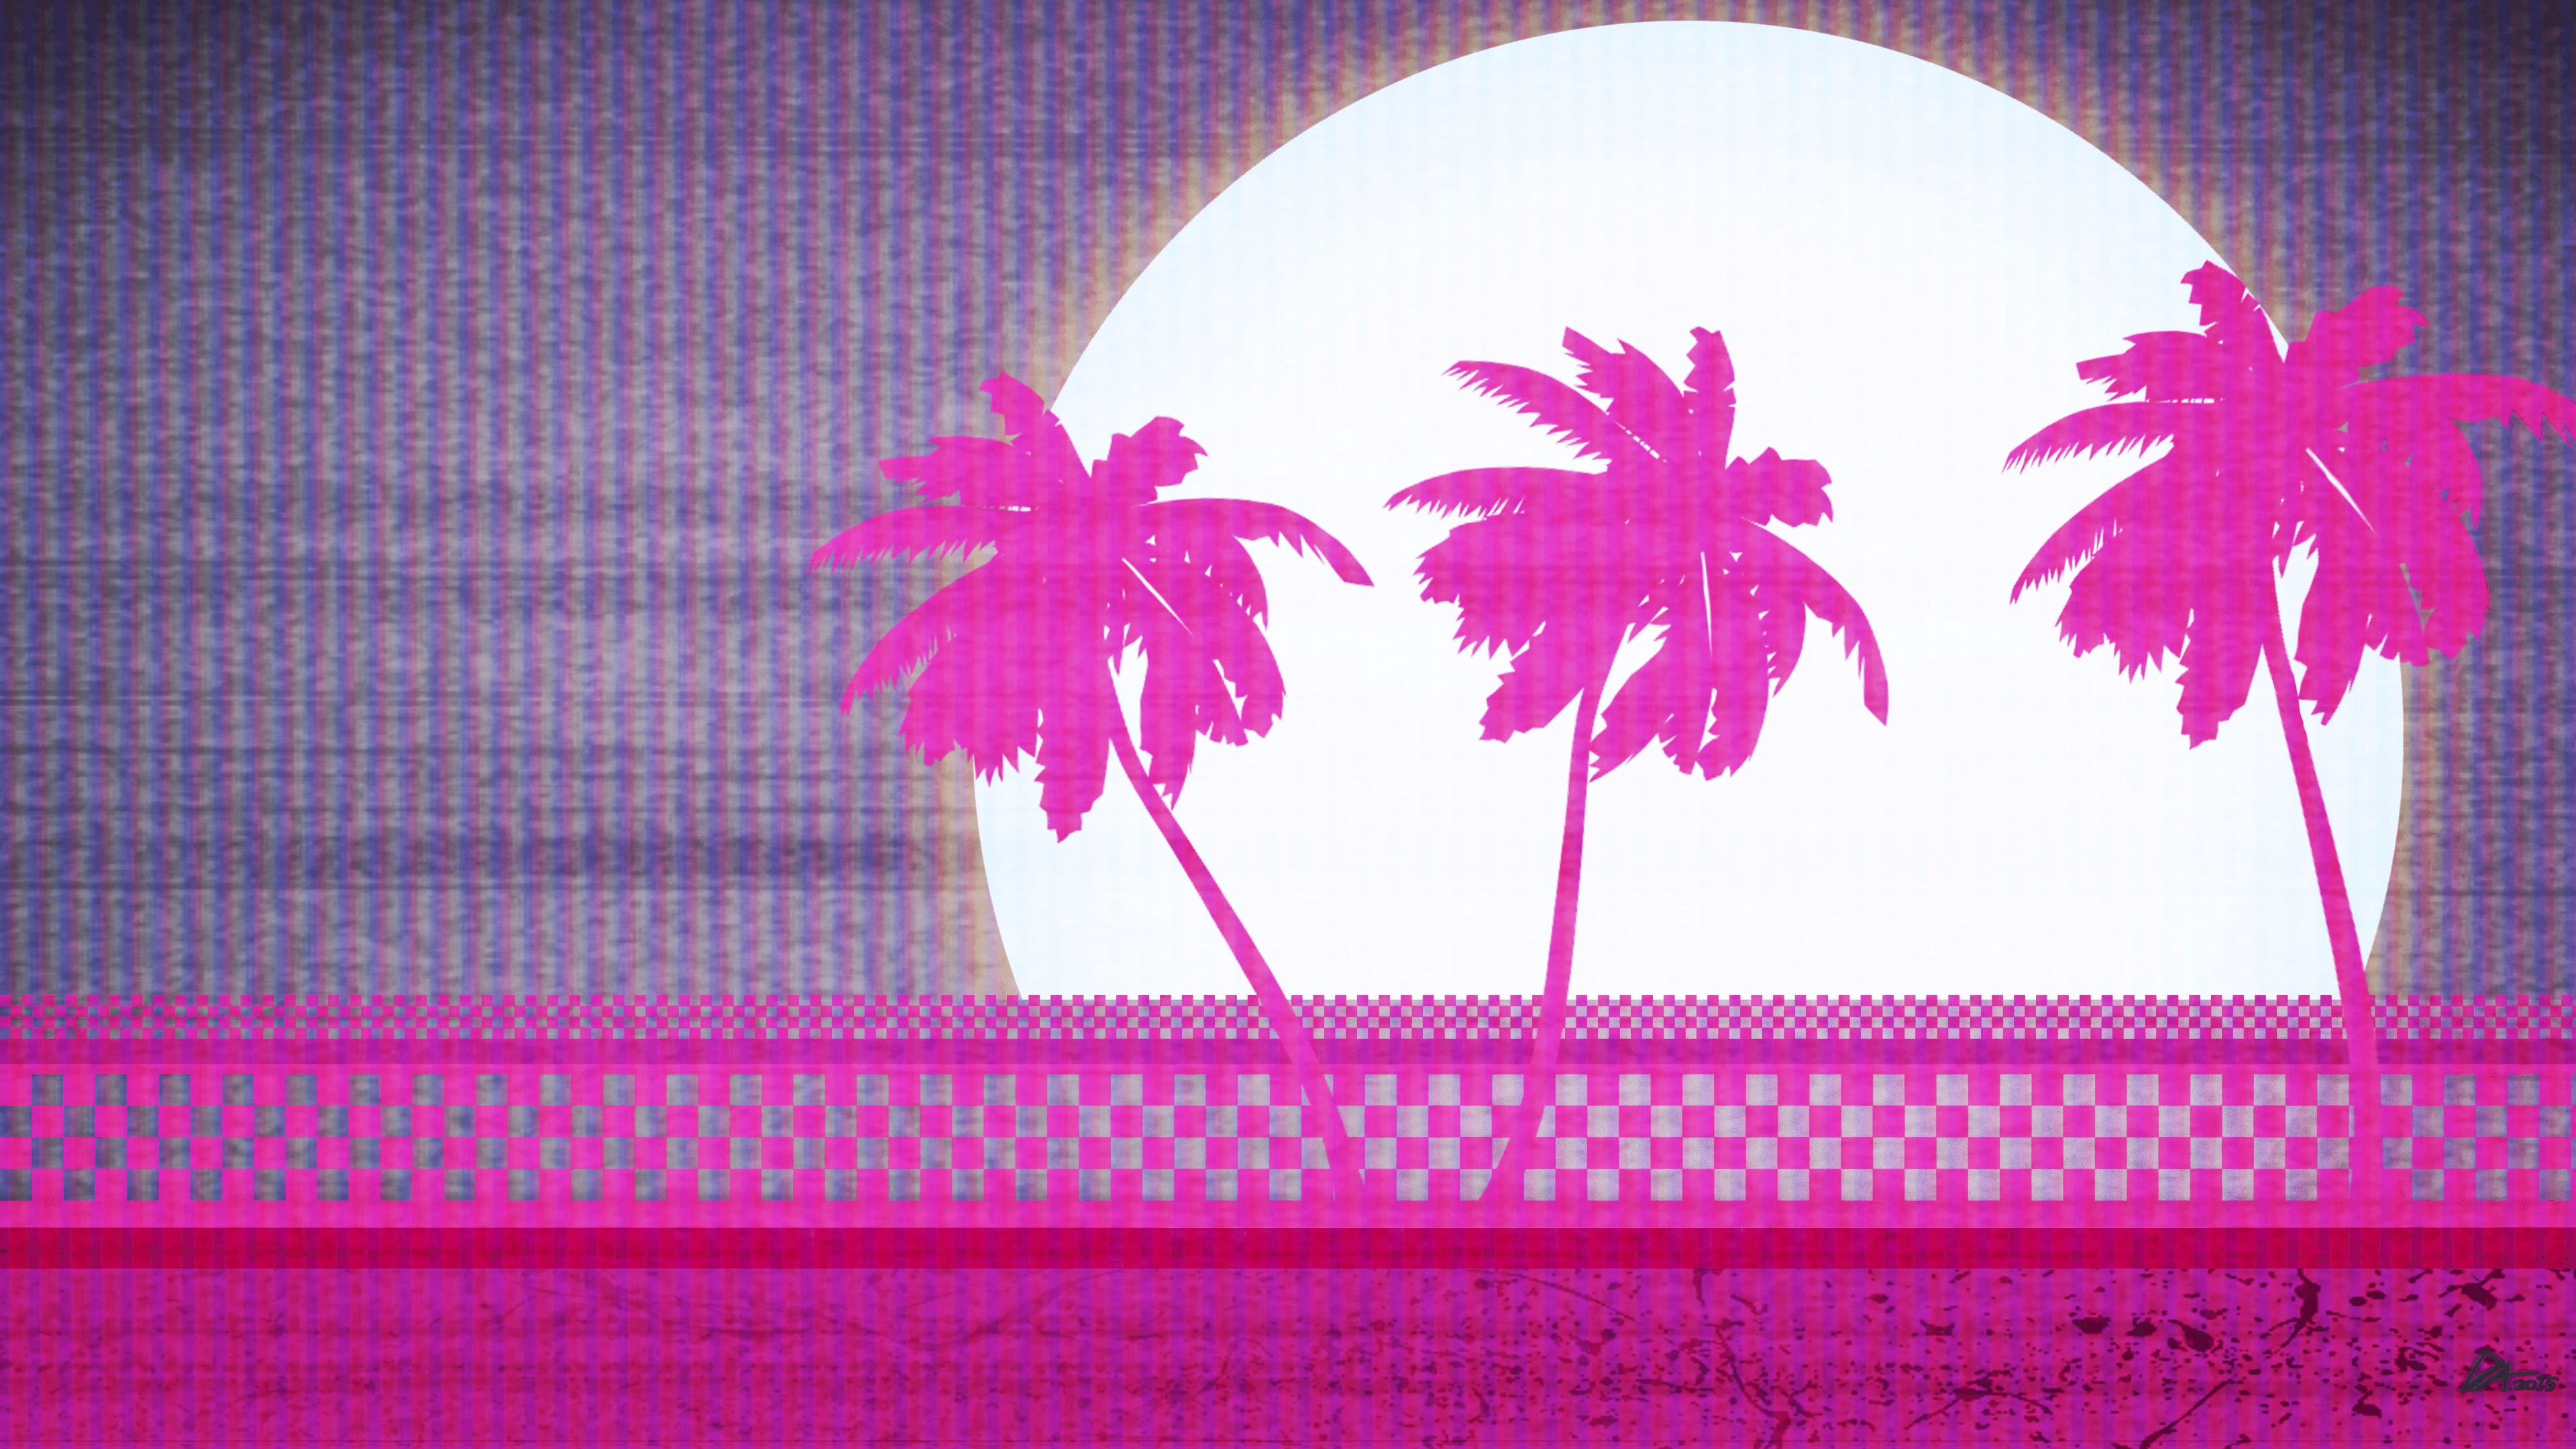 Hotline Miami Wallpapers - Wallpaper Cave